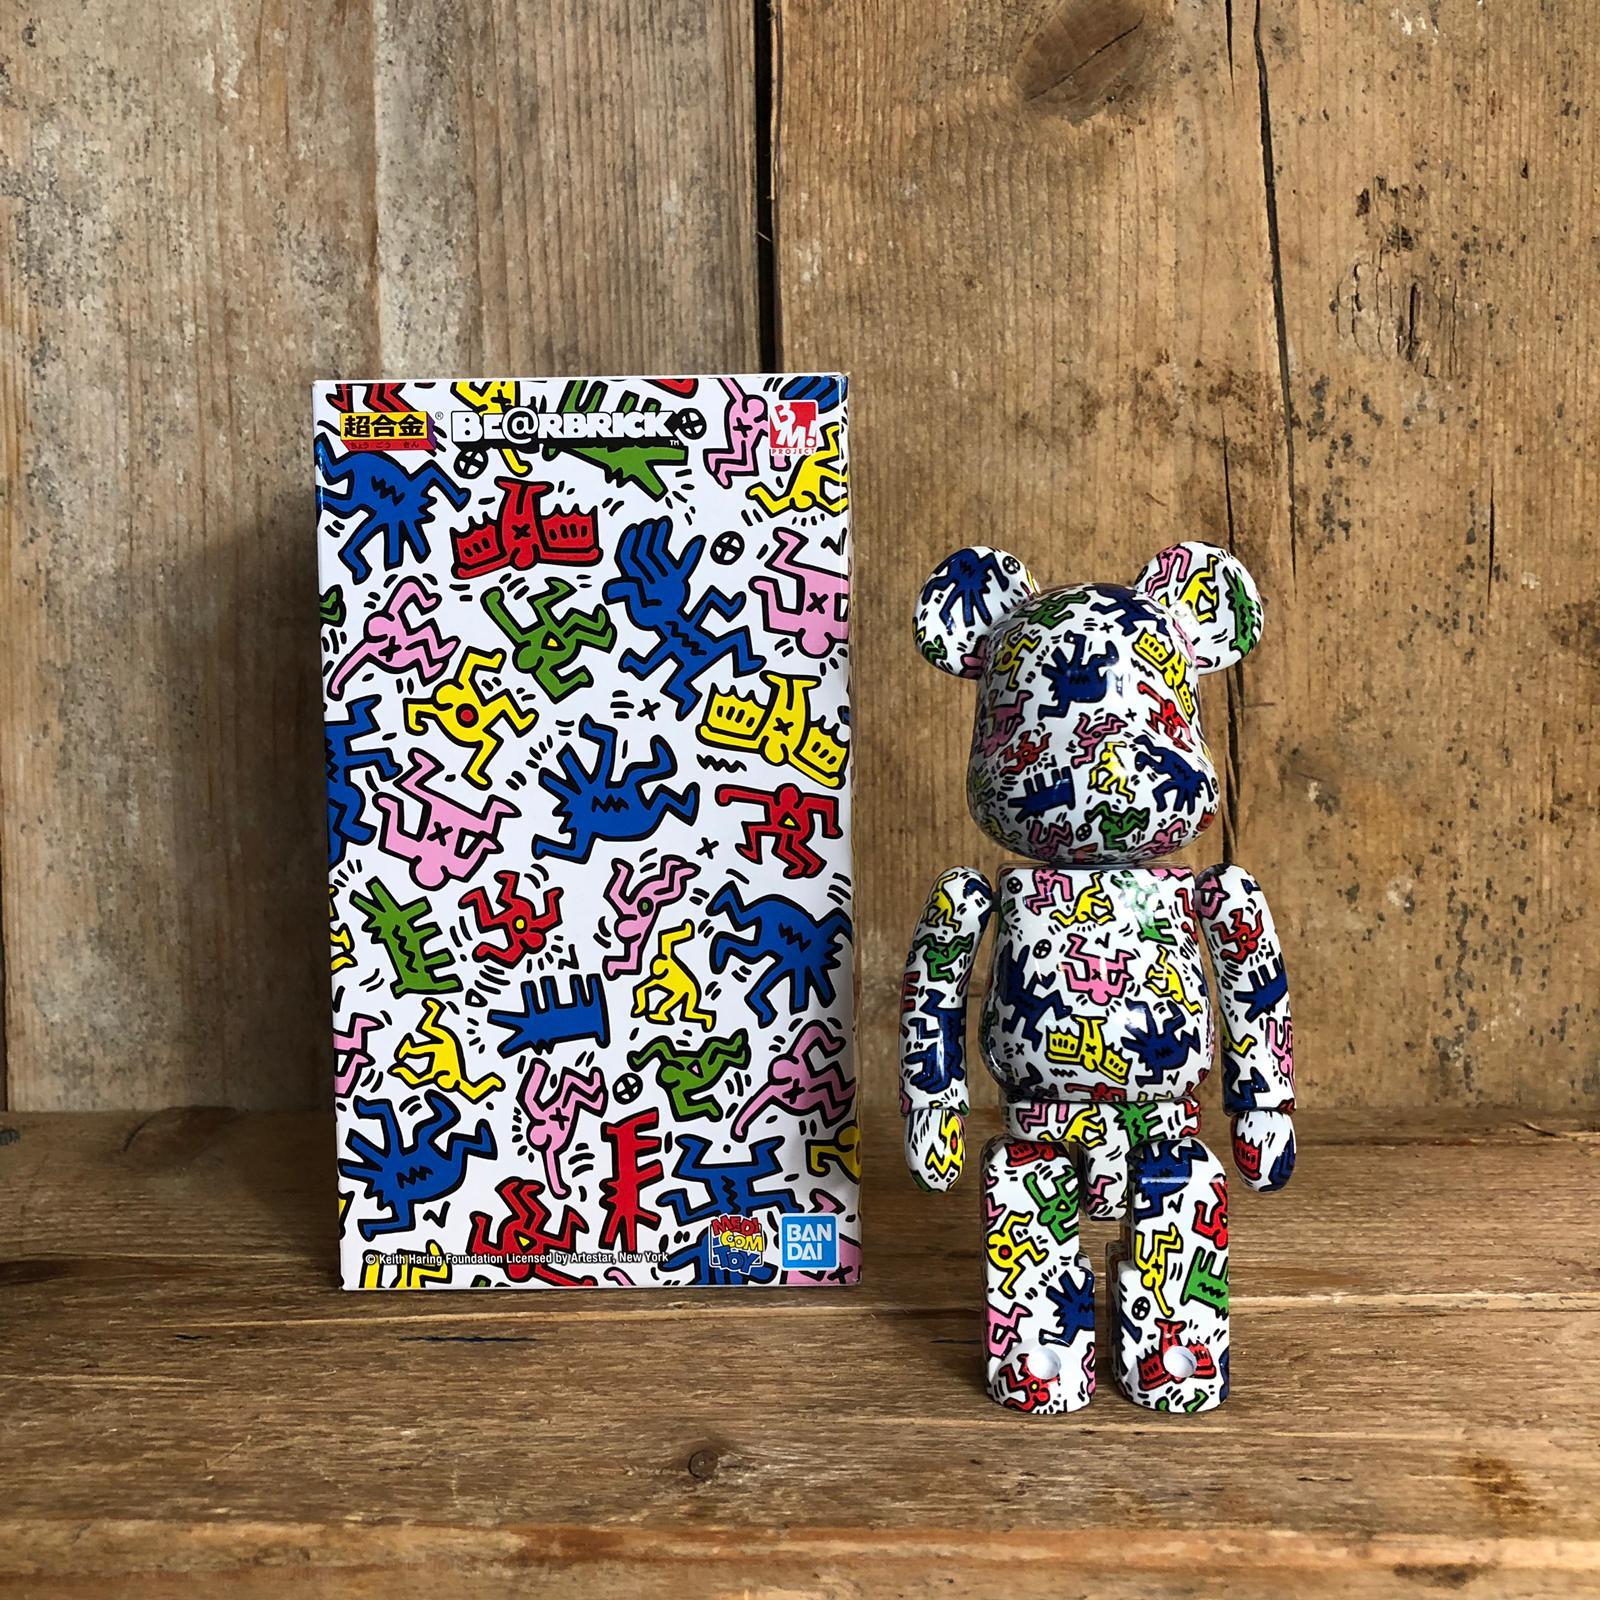 Be@rbrick Medicom Toy 200 Haring 200% Keith Haring